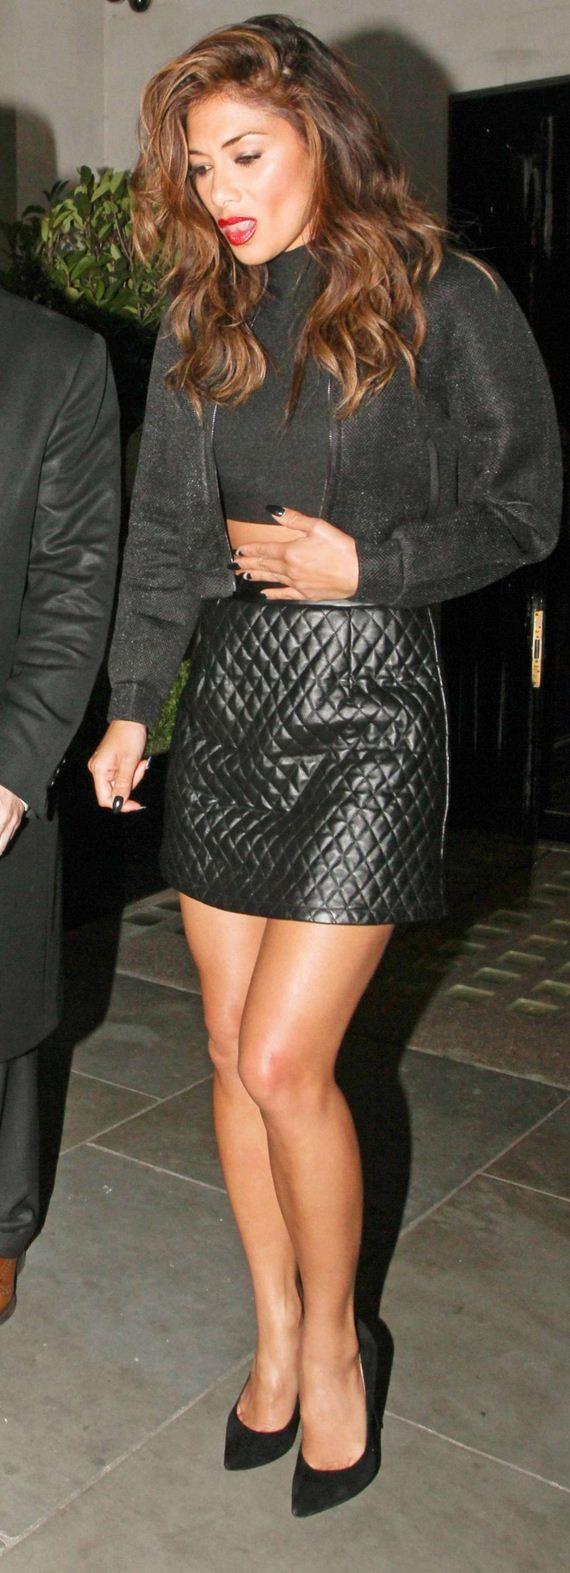 Nicole-Scherzinger---Leaving